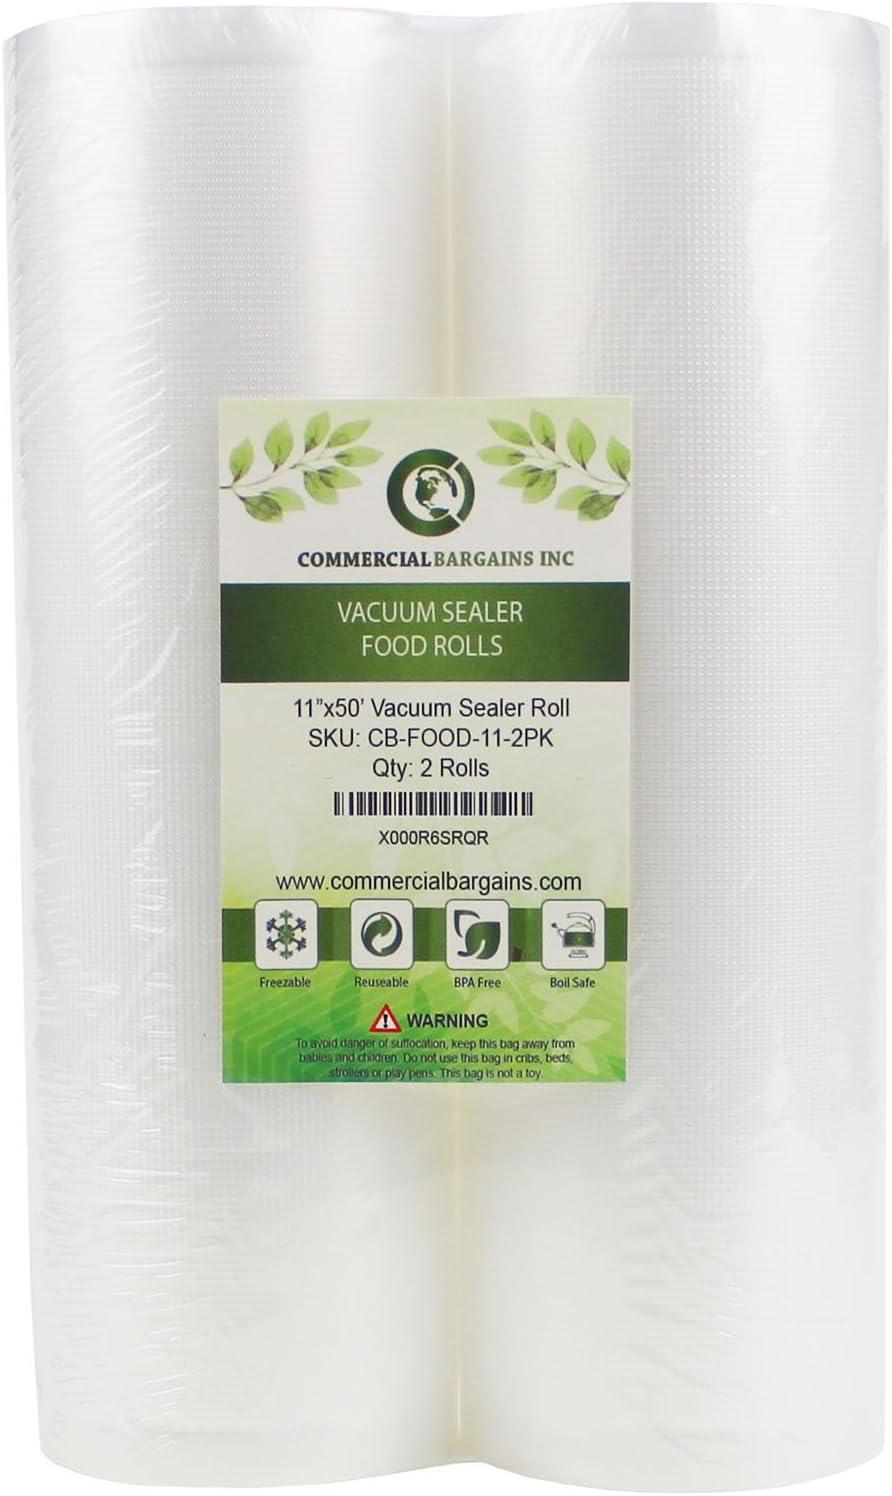 "Commercial Bargains 2 Jumbo 11"" x 50' Commercial Vacuum Sealer Saver Bags Sous Vide Food Storage"